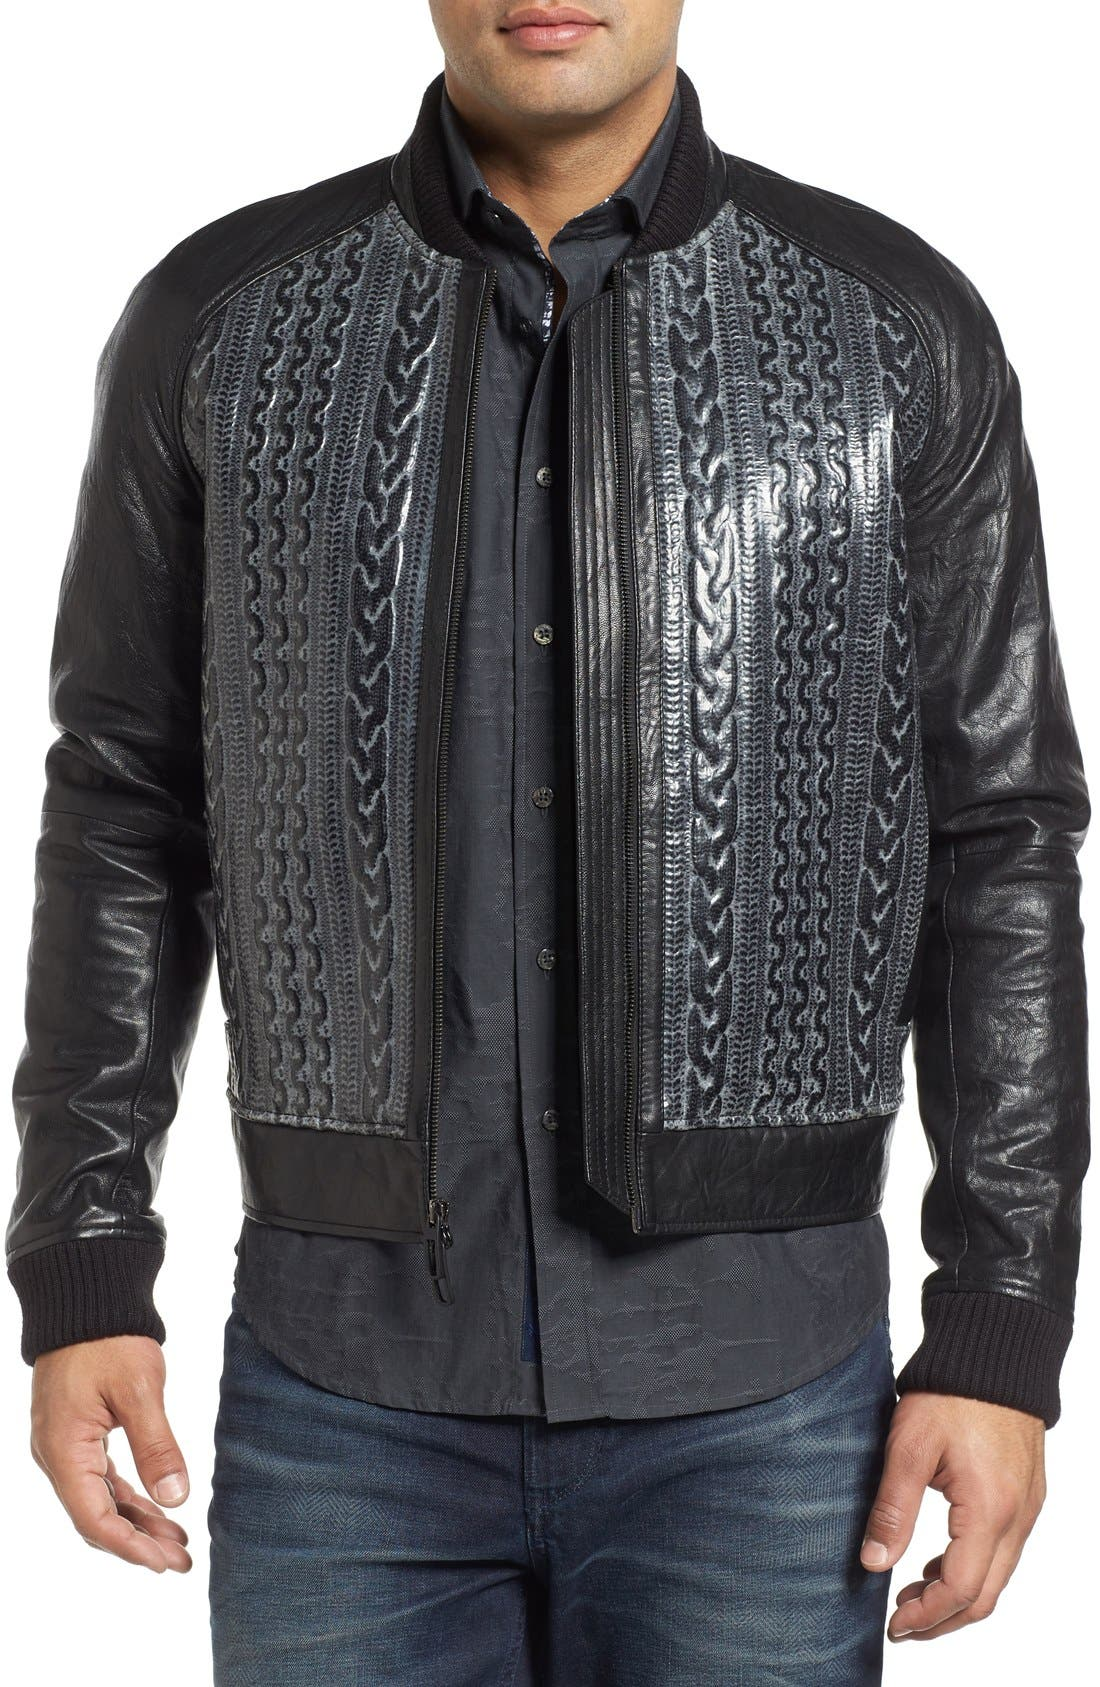 ROBERT GRAHAM Romulus Goatskin Leather Jacket, Main, color, 001